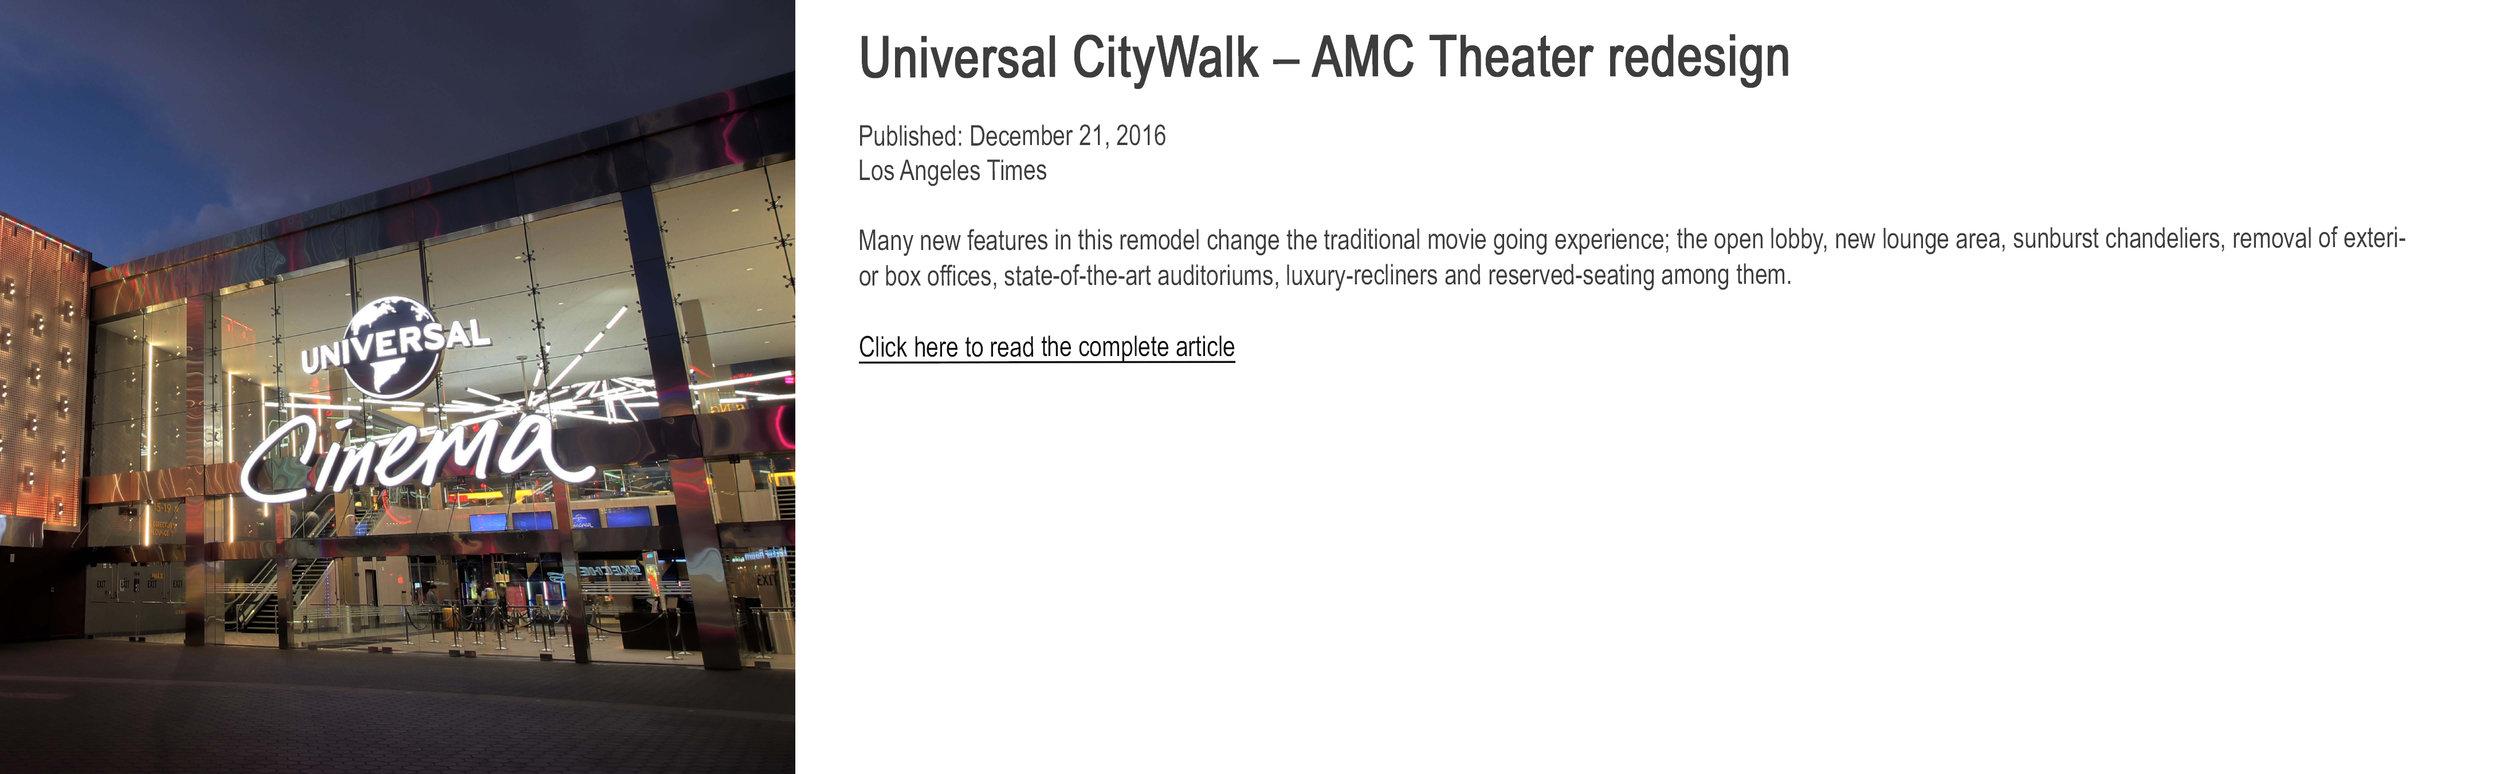 Universal CityWalk.jpg